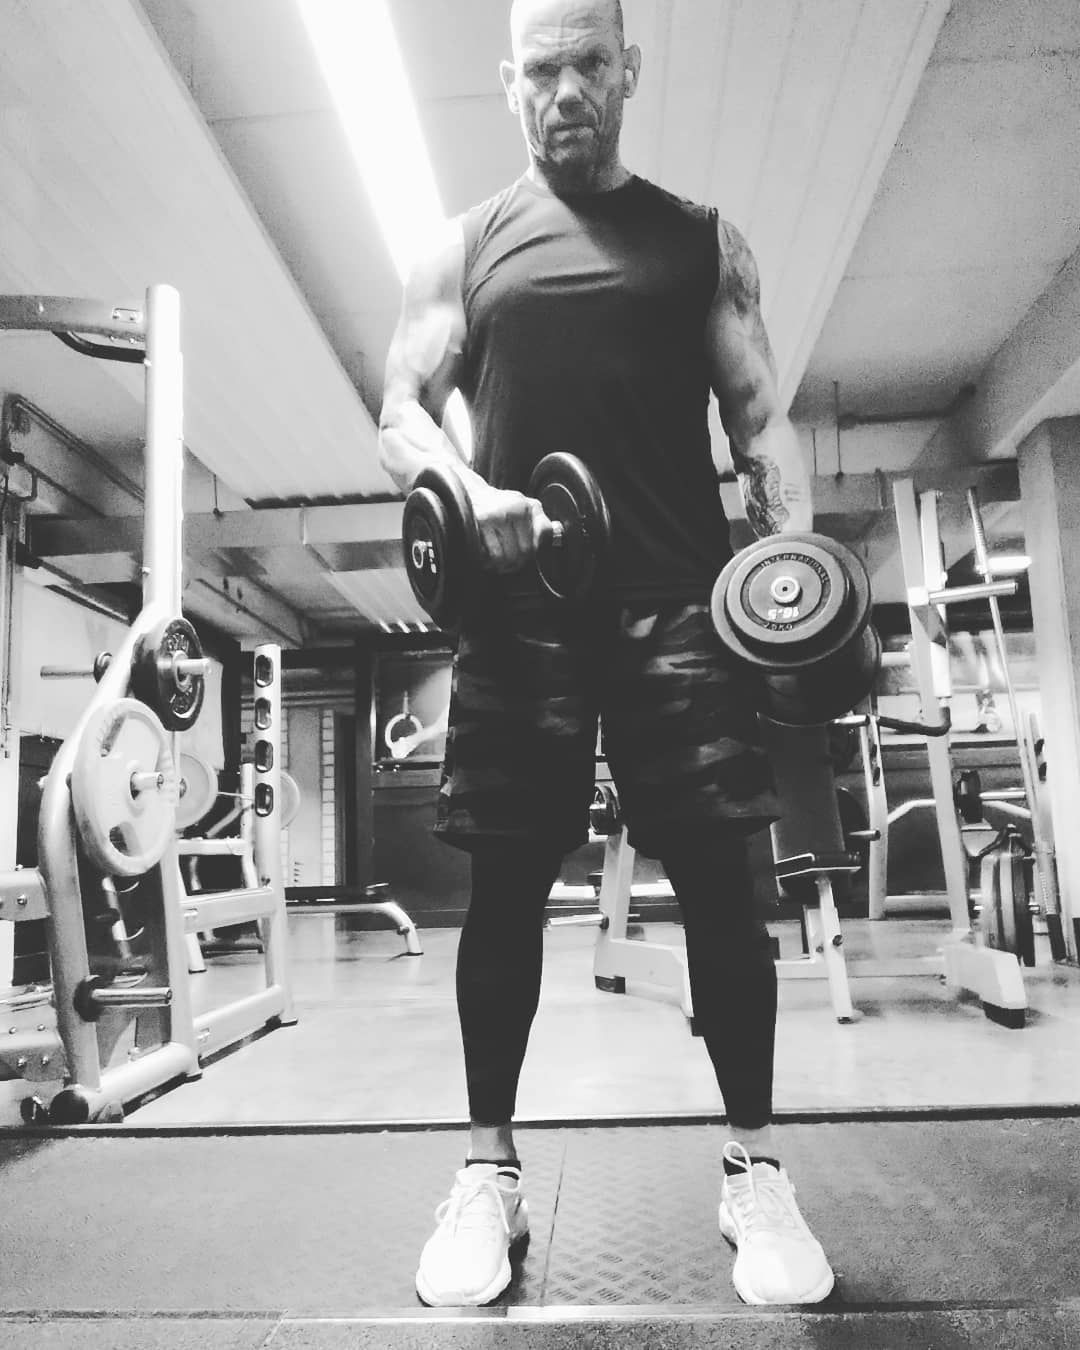 #adidas #Bizeps #fitness #fitnessstudio preisvergleich #langhantel #adidas #Bizeps #fitness #langhan...